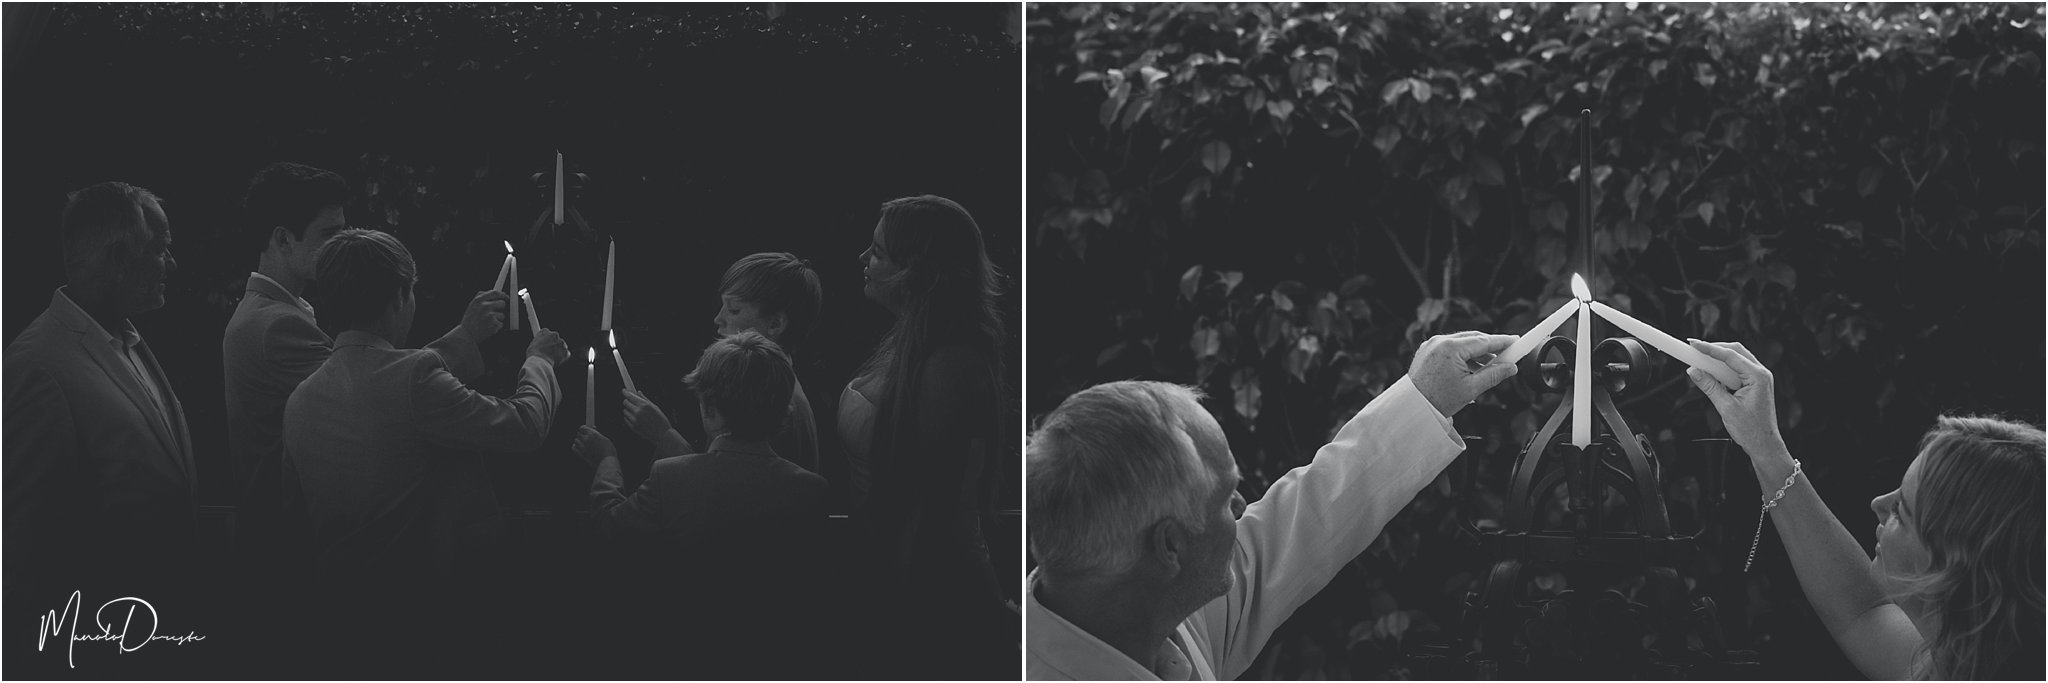 0393_ManoloDoreste_InFocusStudios_Wedding_Family_Photography_Miami_MiamiPhotographer.jpg